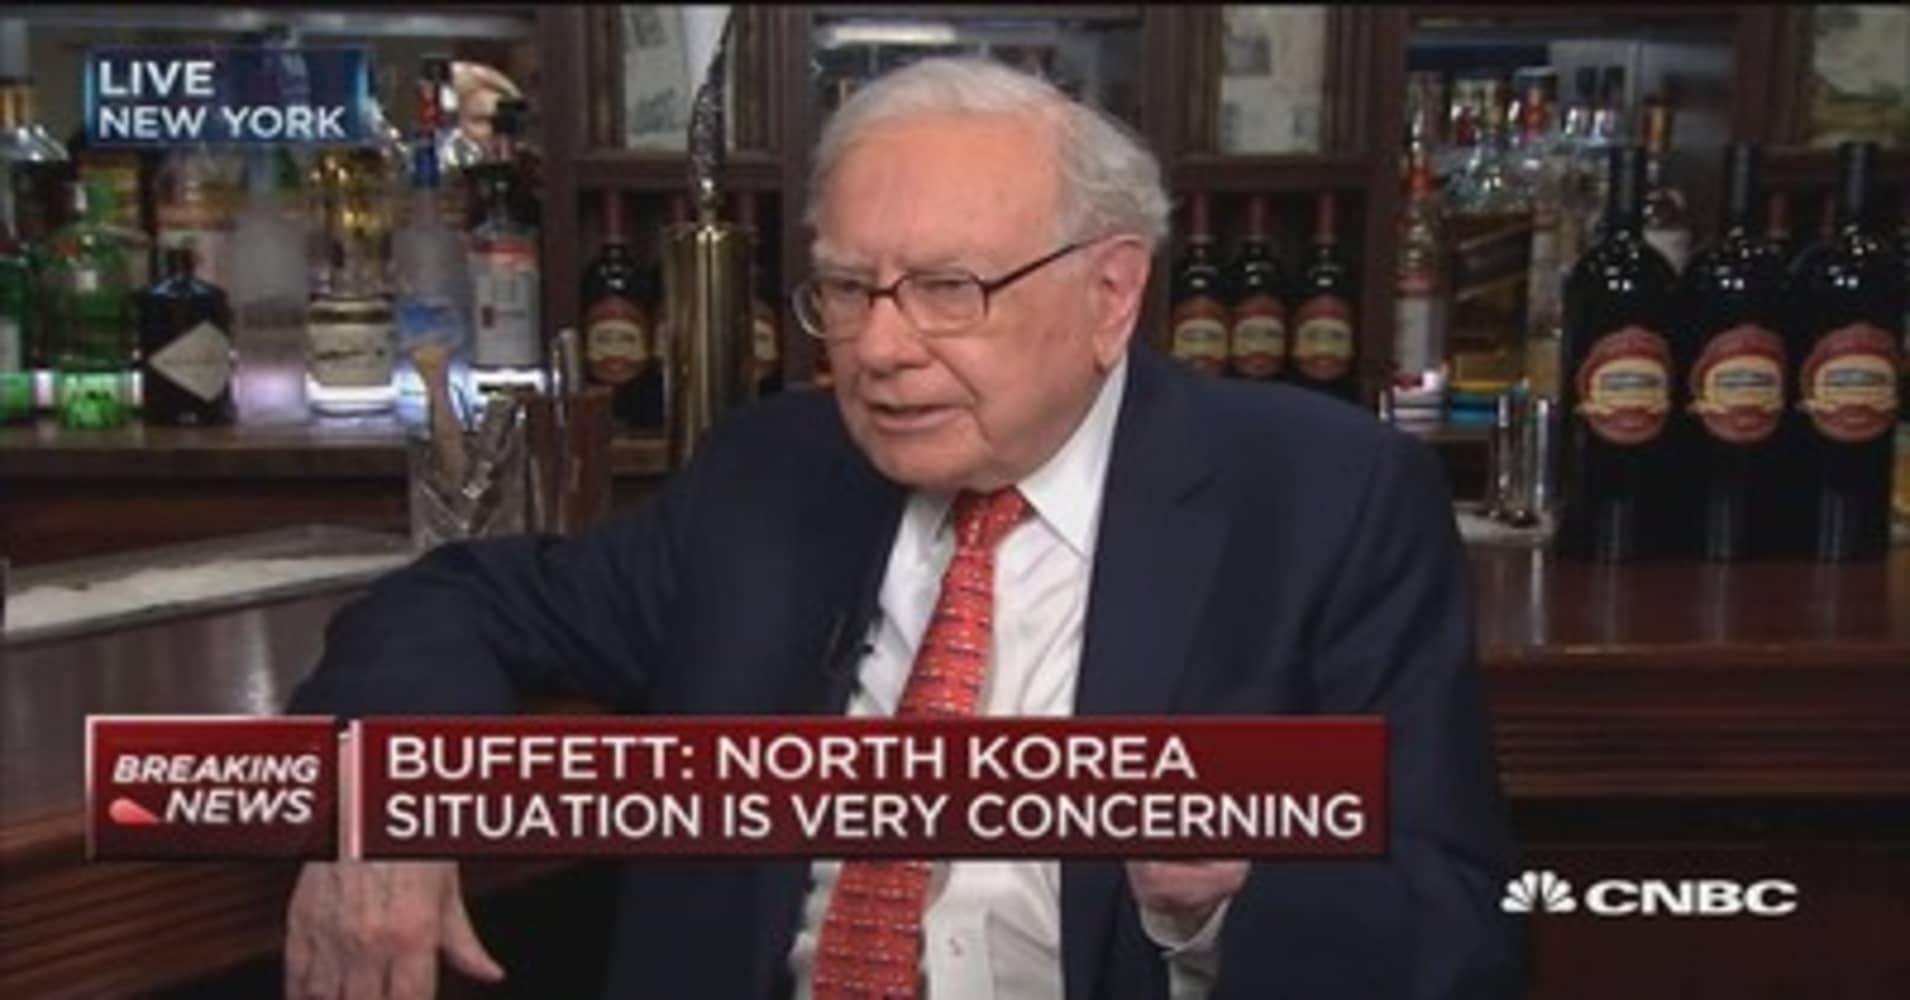 Warren Buffett: Here's why I haven't been criticizing Donald Trump